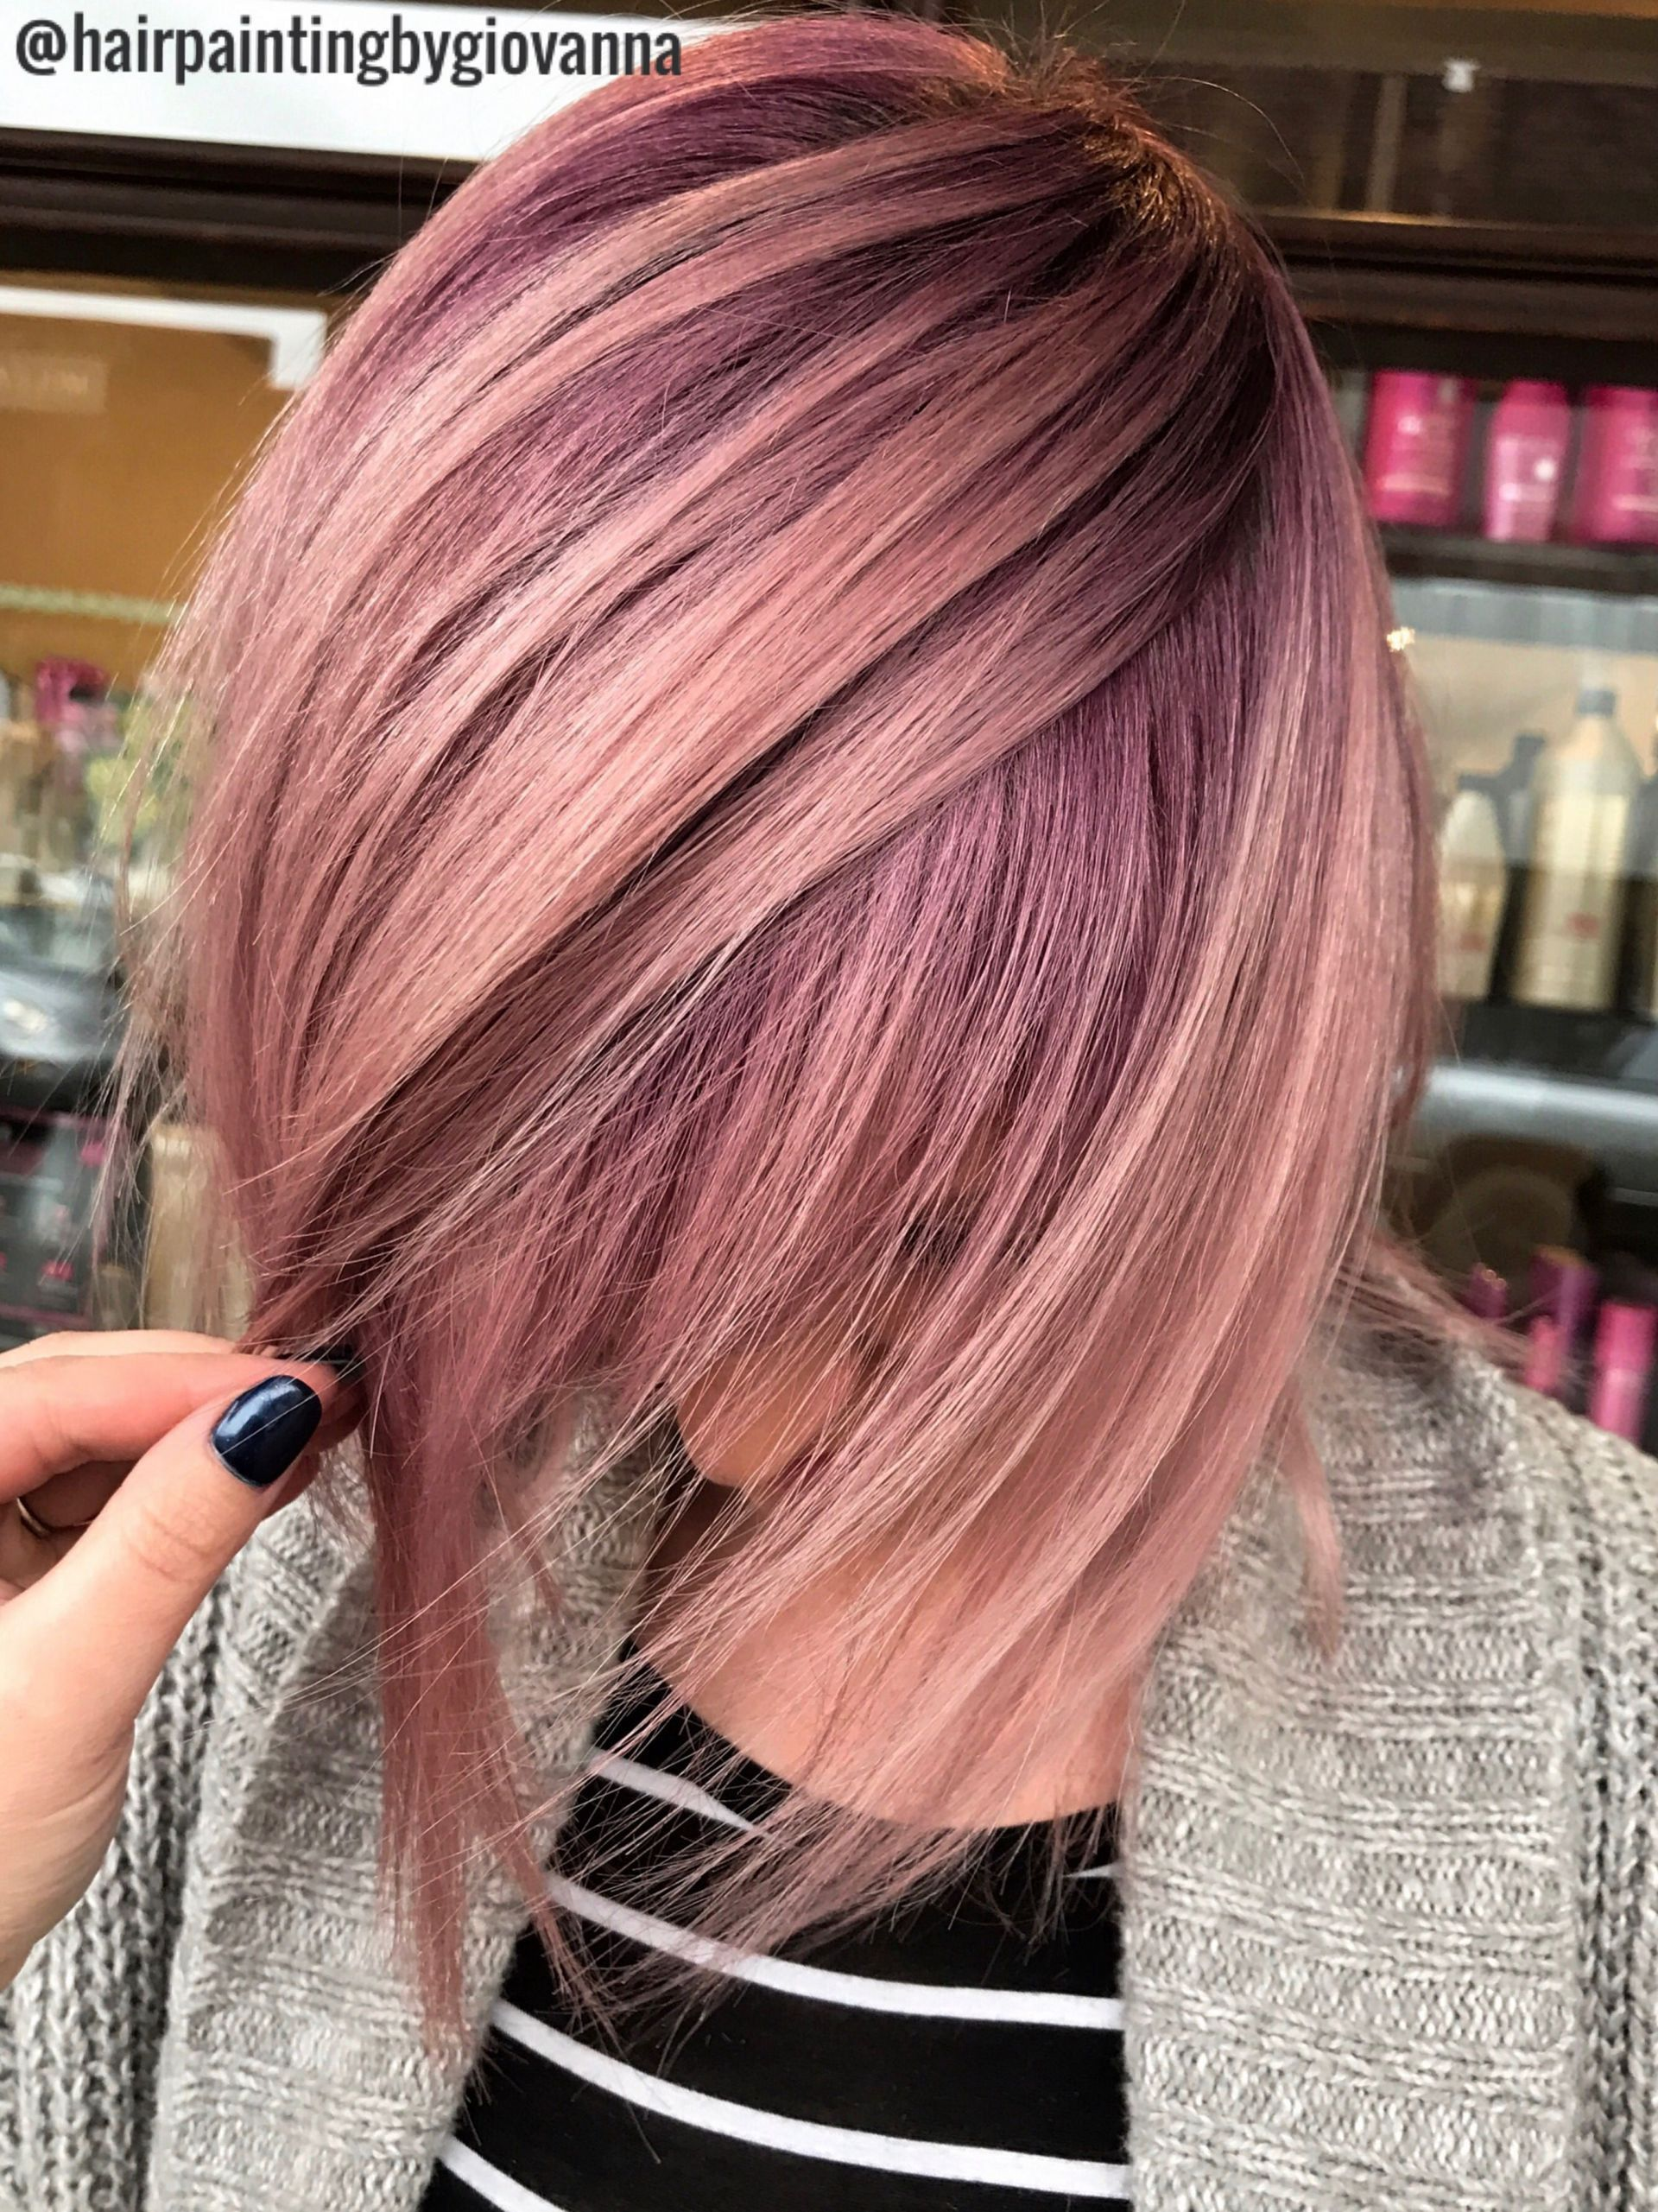 Df3bd4a3084f99549f9f5cc11c01f99a Jpg 1 200 1 600 Pixels Hair Styles Bob Hair Color Red Blonde Hair